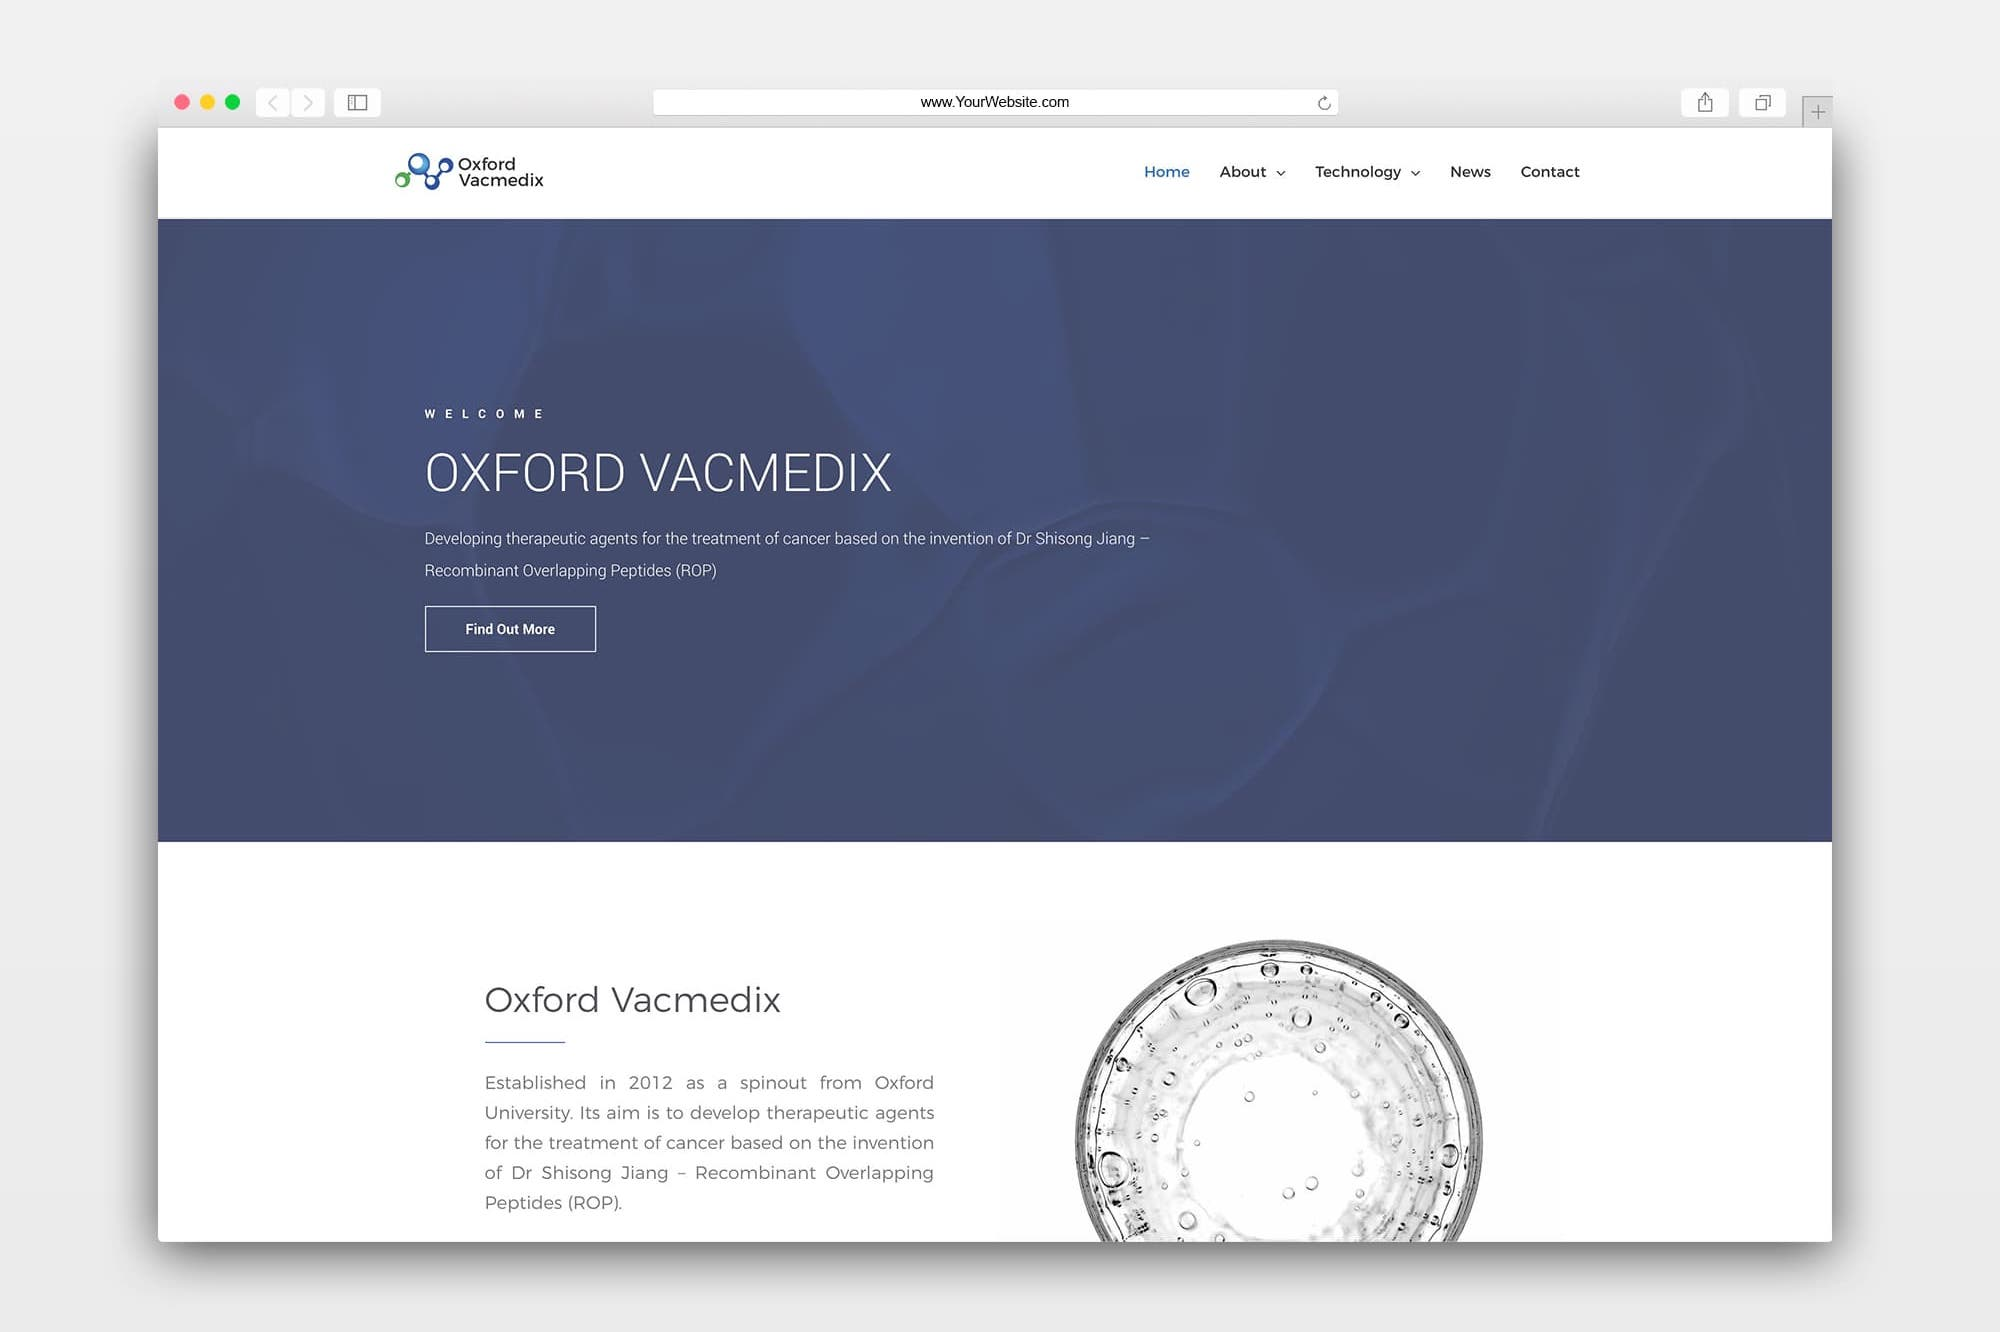 Oxford Vacmedix